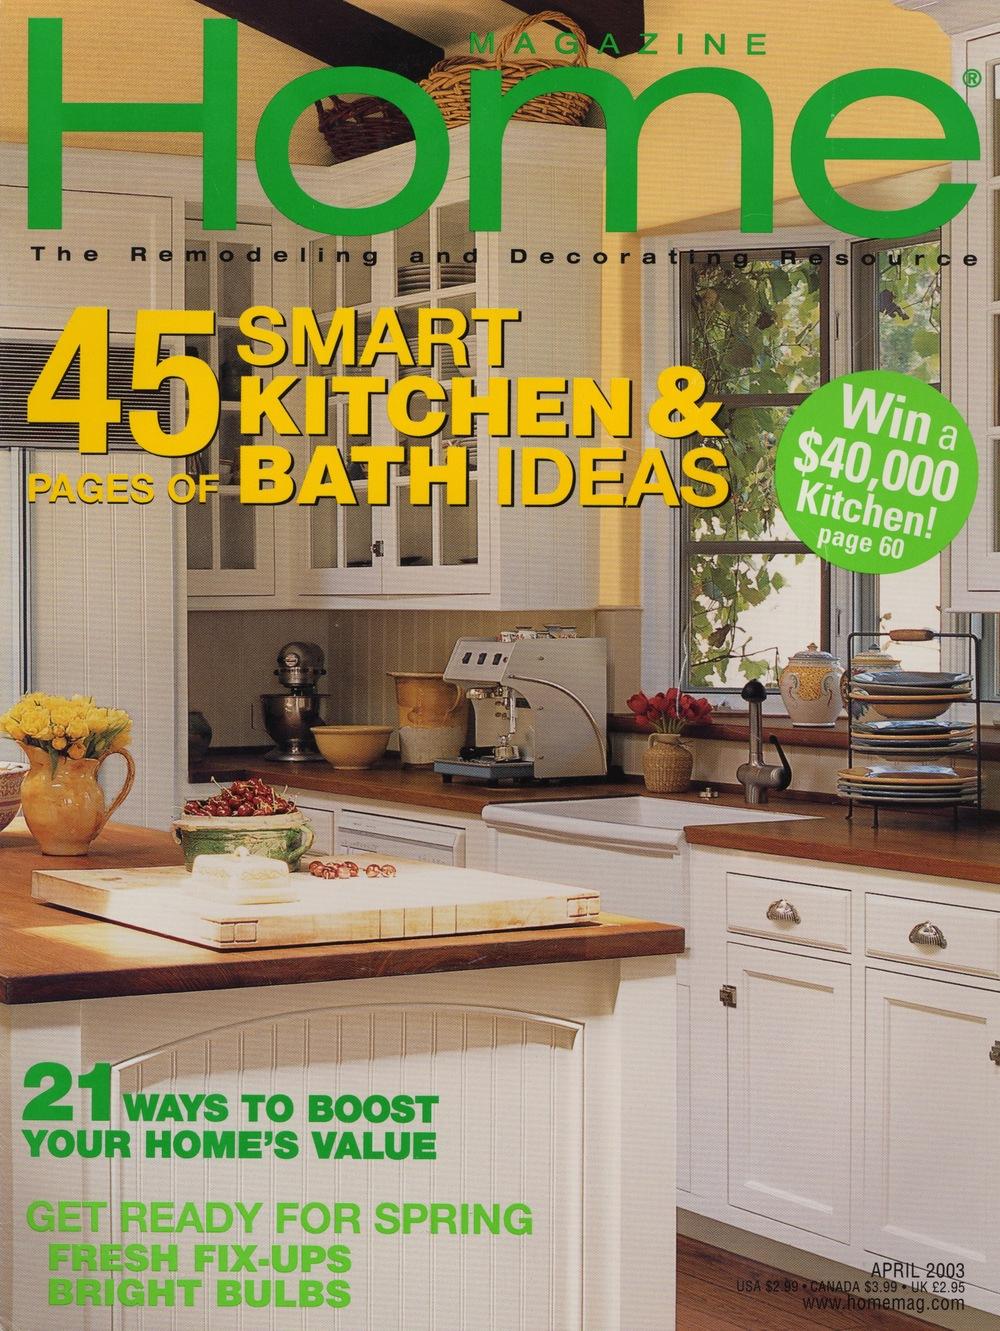 Home Magazine - Window Seat - Cover.jpg